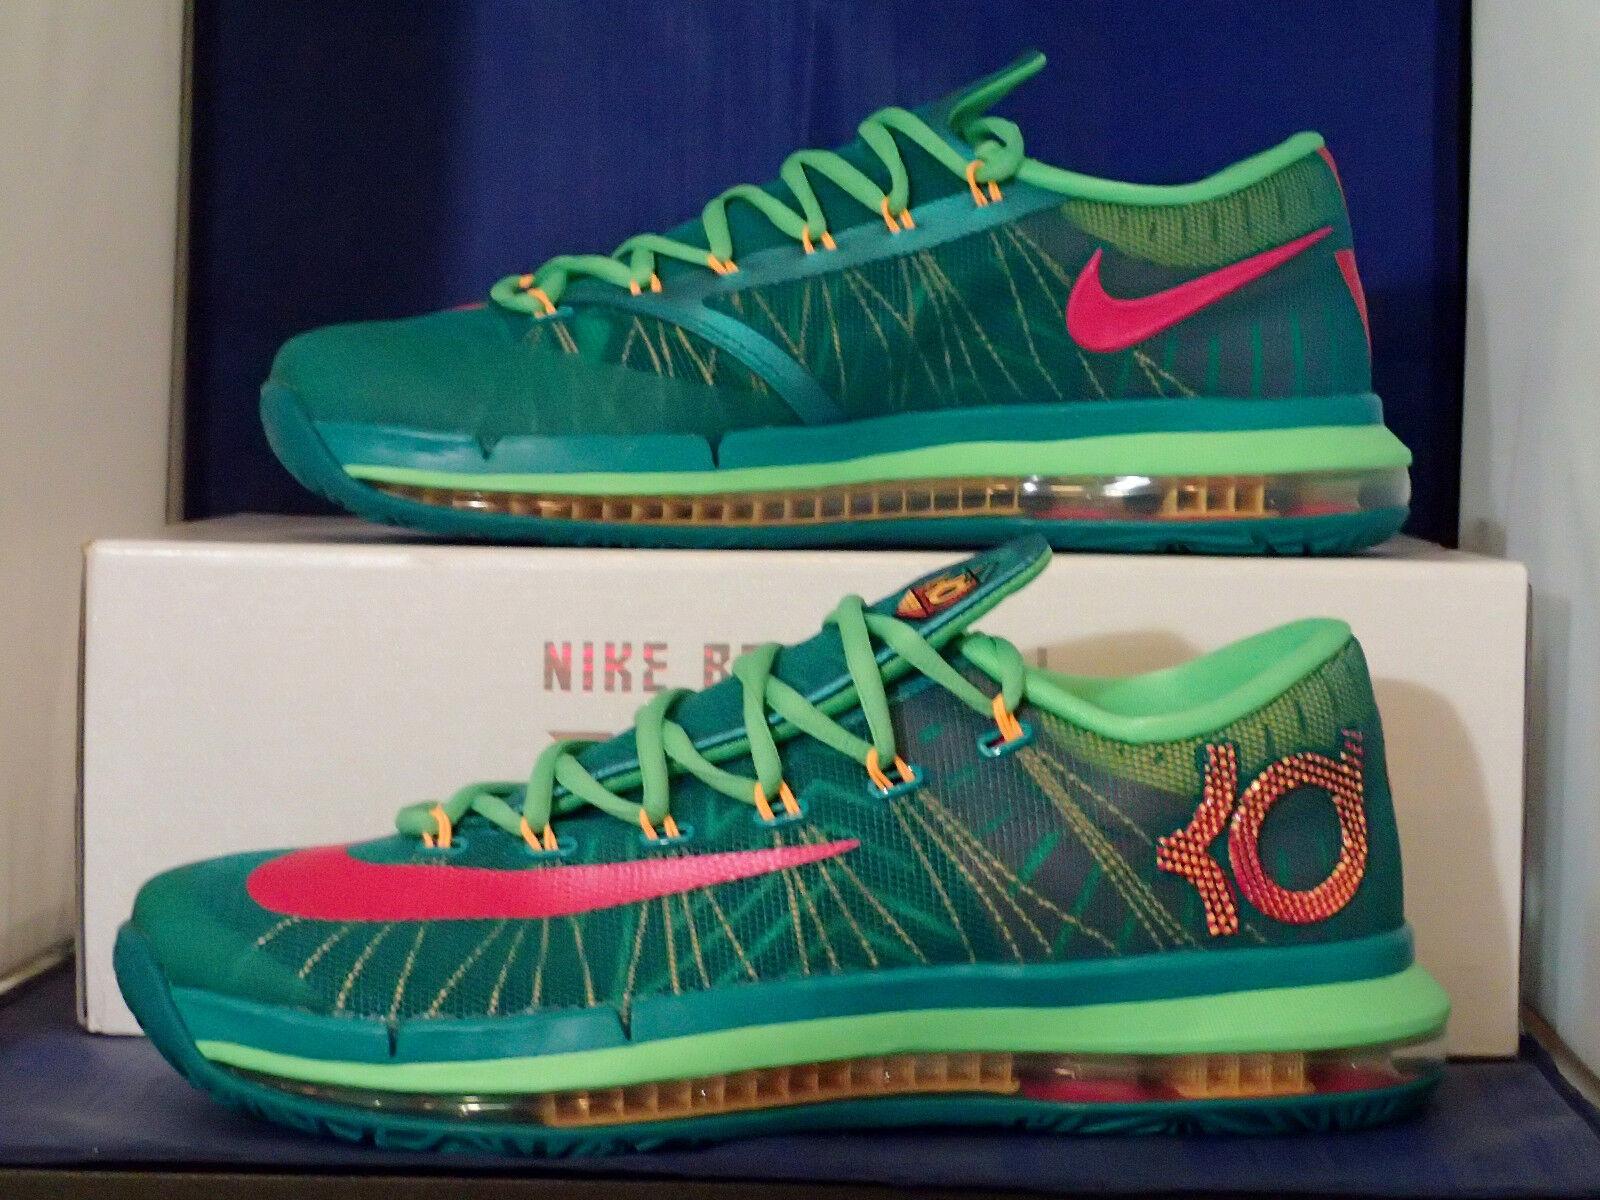 Nike KD VI 6 Elite Superhero Turbo Green Vivid Pink SZ 10.5 ( 642838-300 )